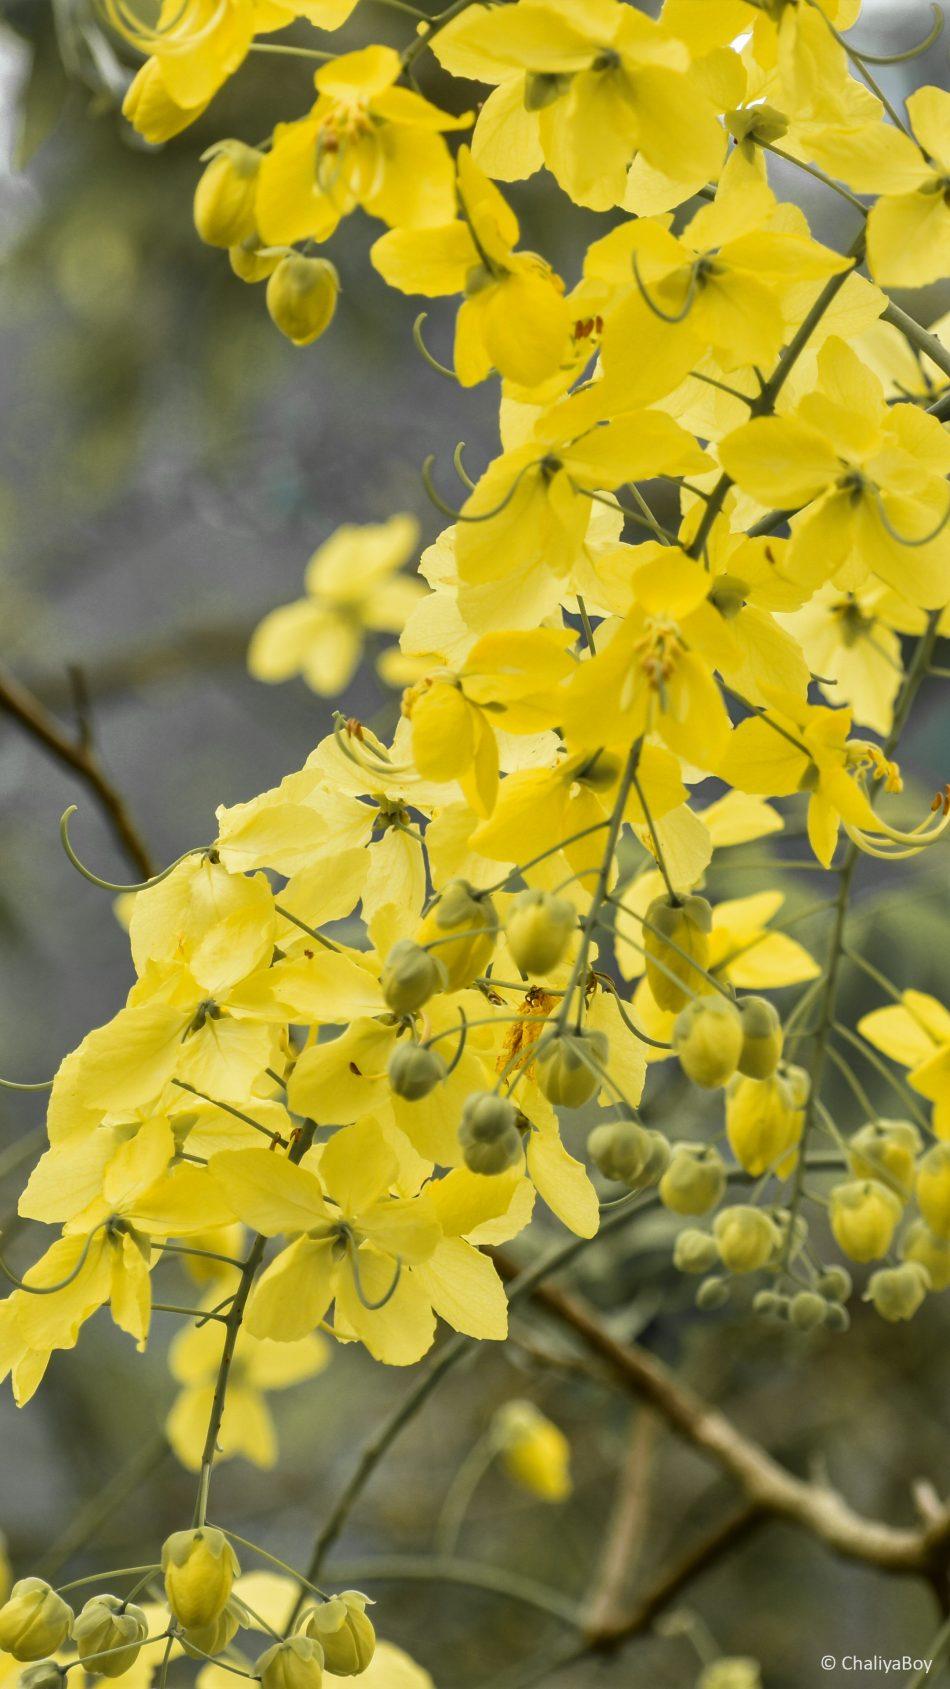 Yellow Golden Shower Flowers 4k Ultra Hd Mobile Wallpaper - Yellow Flower Wallpaper Hd For Mobile - HD Wallpaper